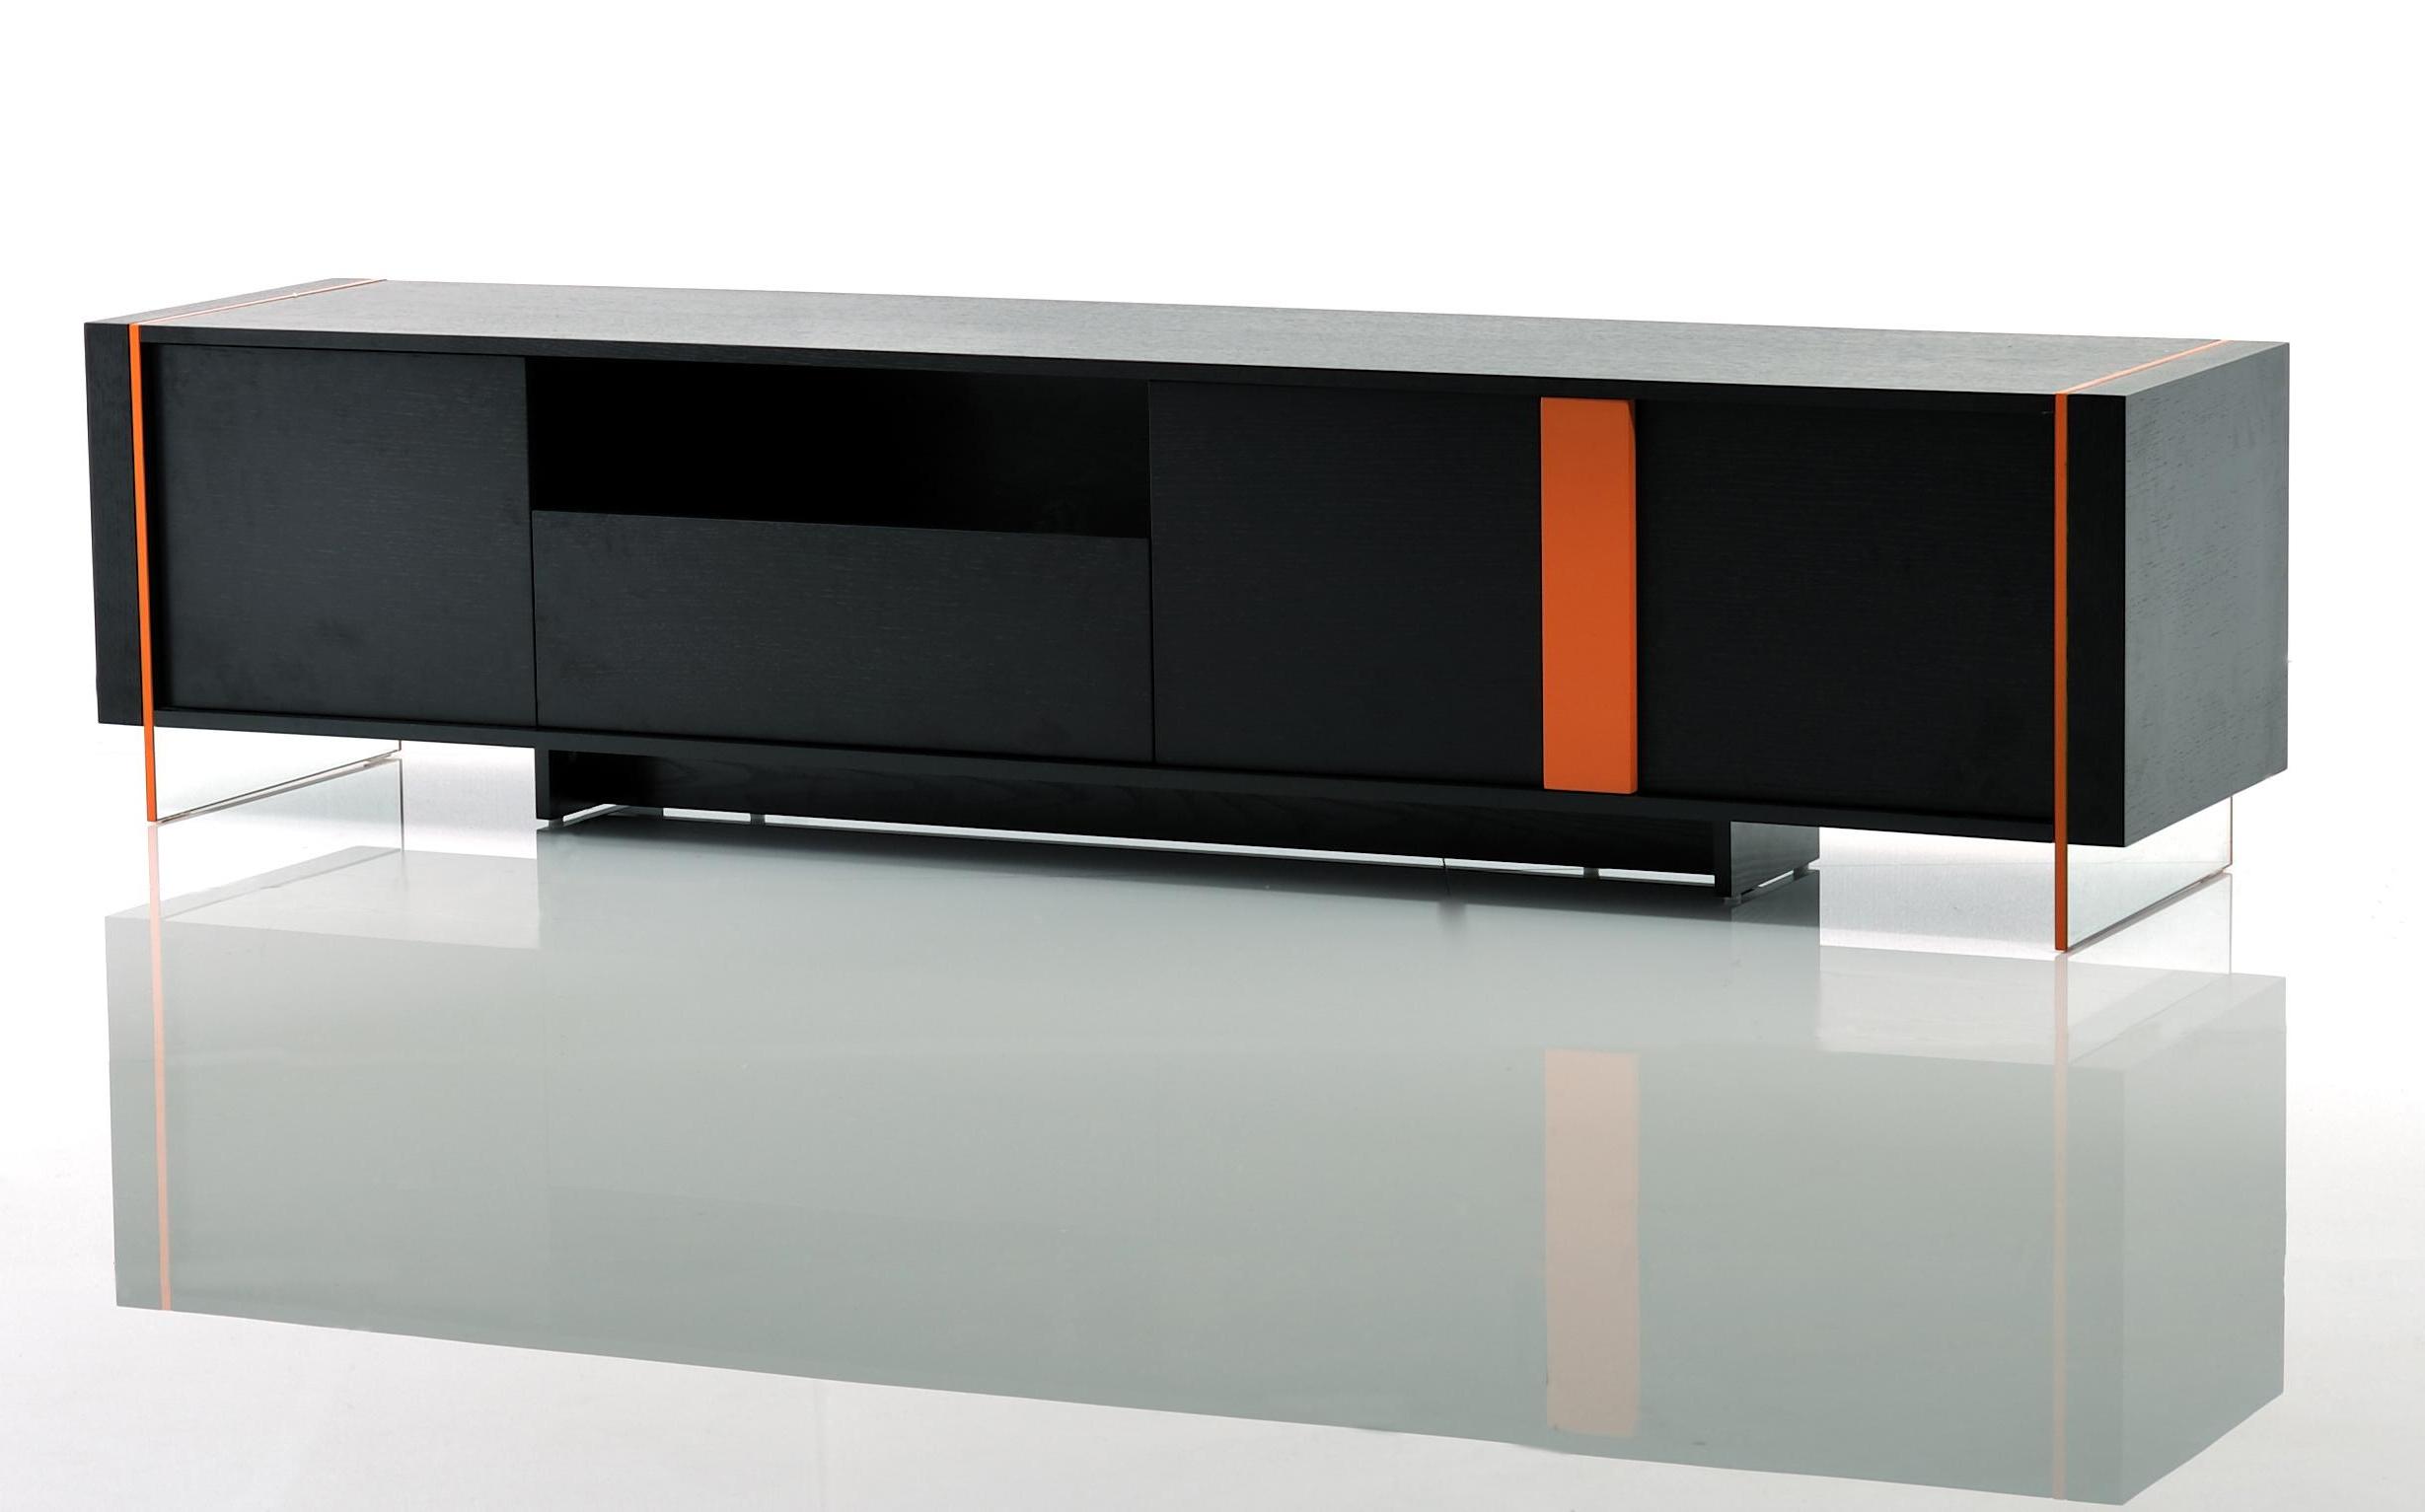 Popular Contemporary Black Oak And Orange Floating Tv Stand Austin Texas Vvis Intended For Oak Effect Corner Tv Stand (Gallery 16 of 20)